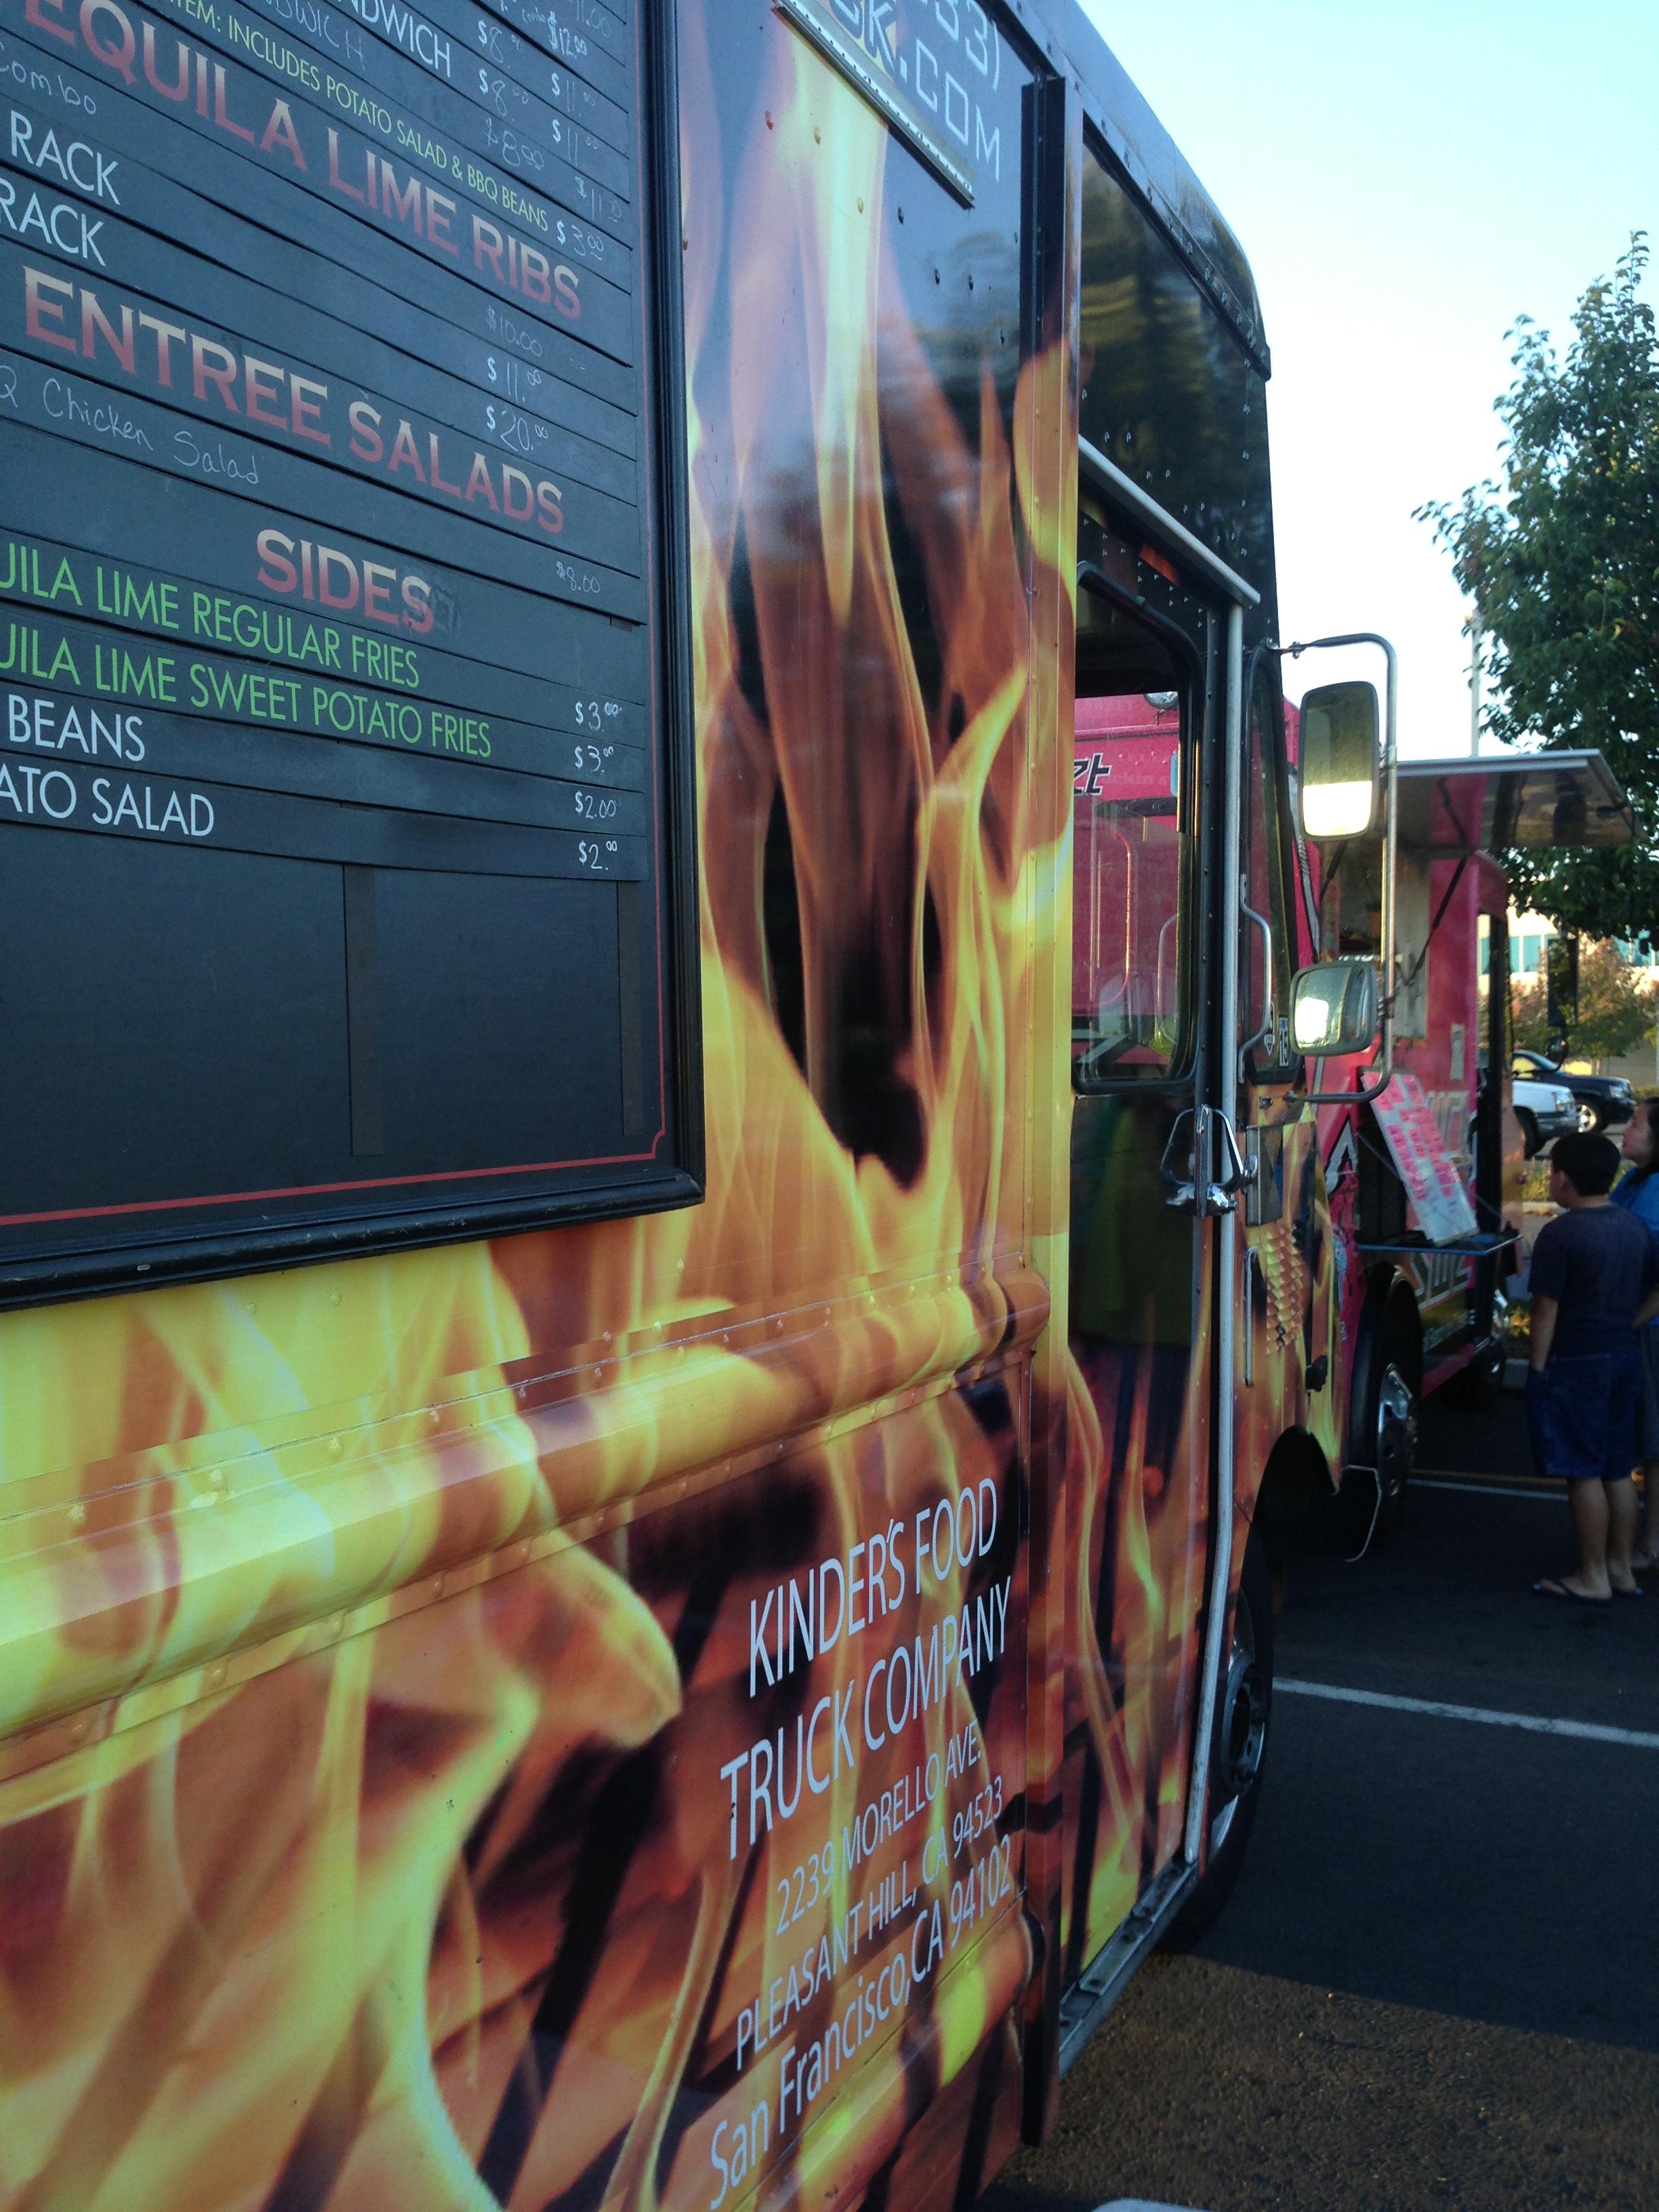 Kinders Food Truck